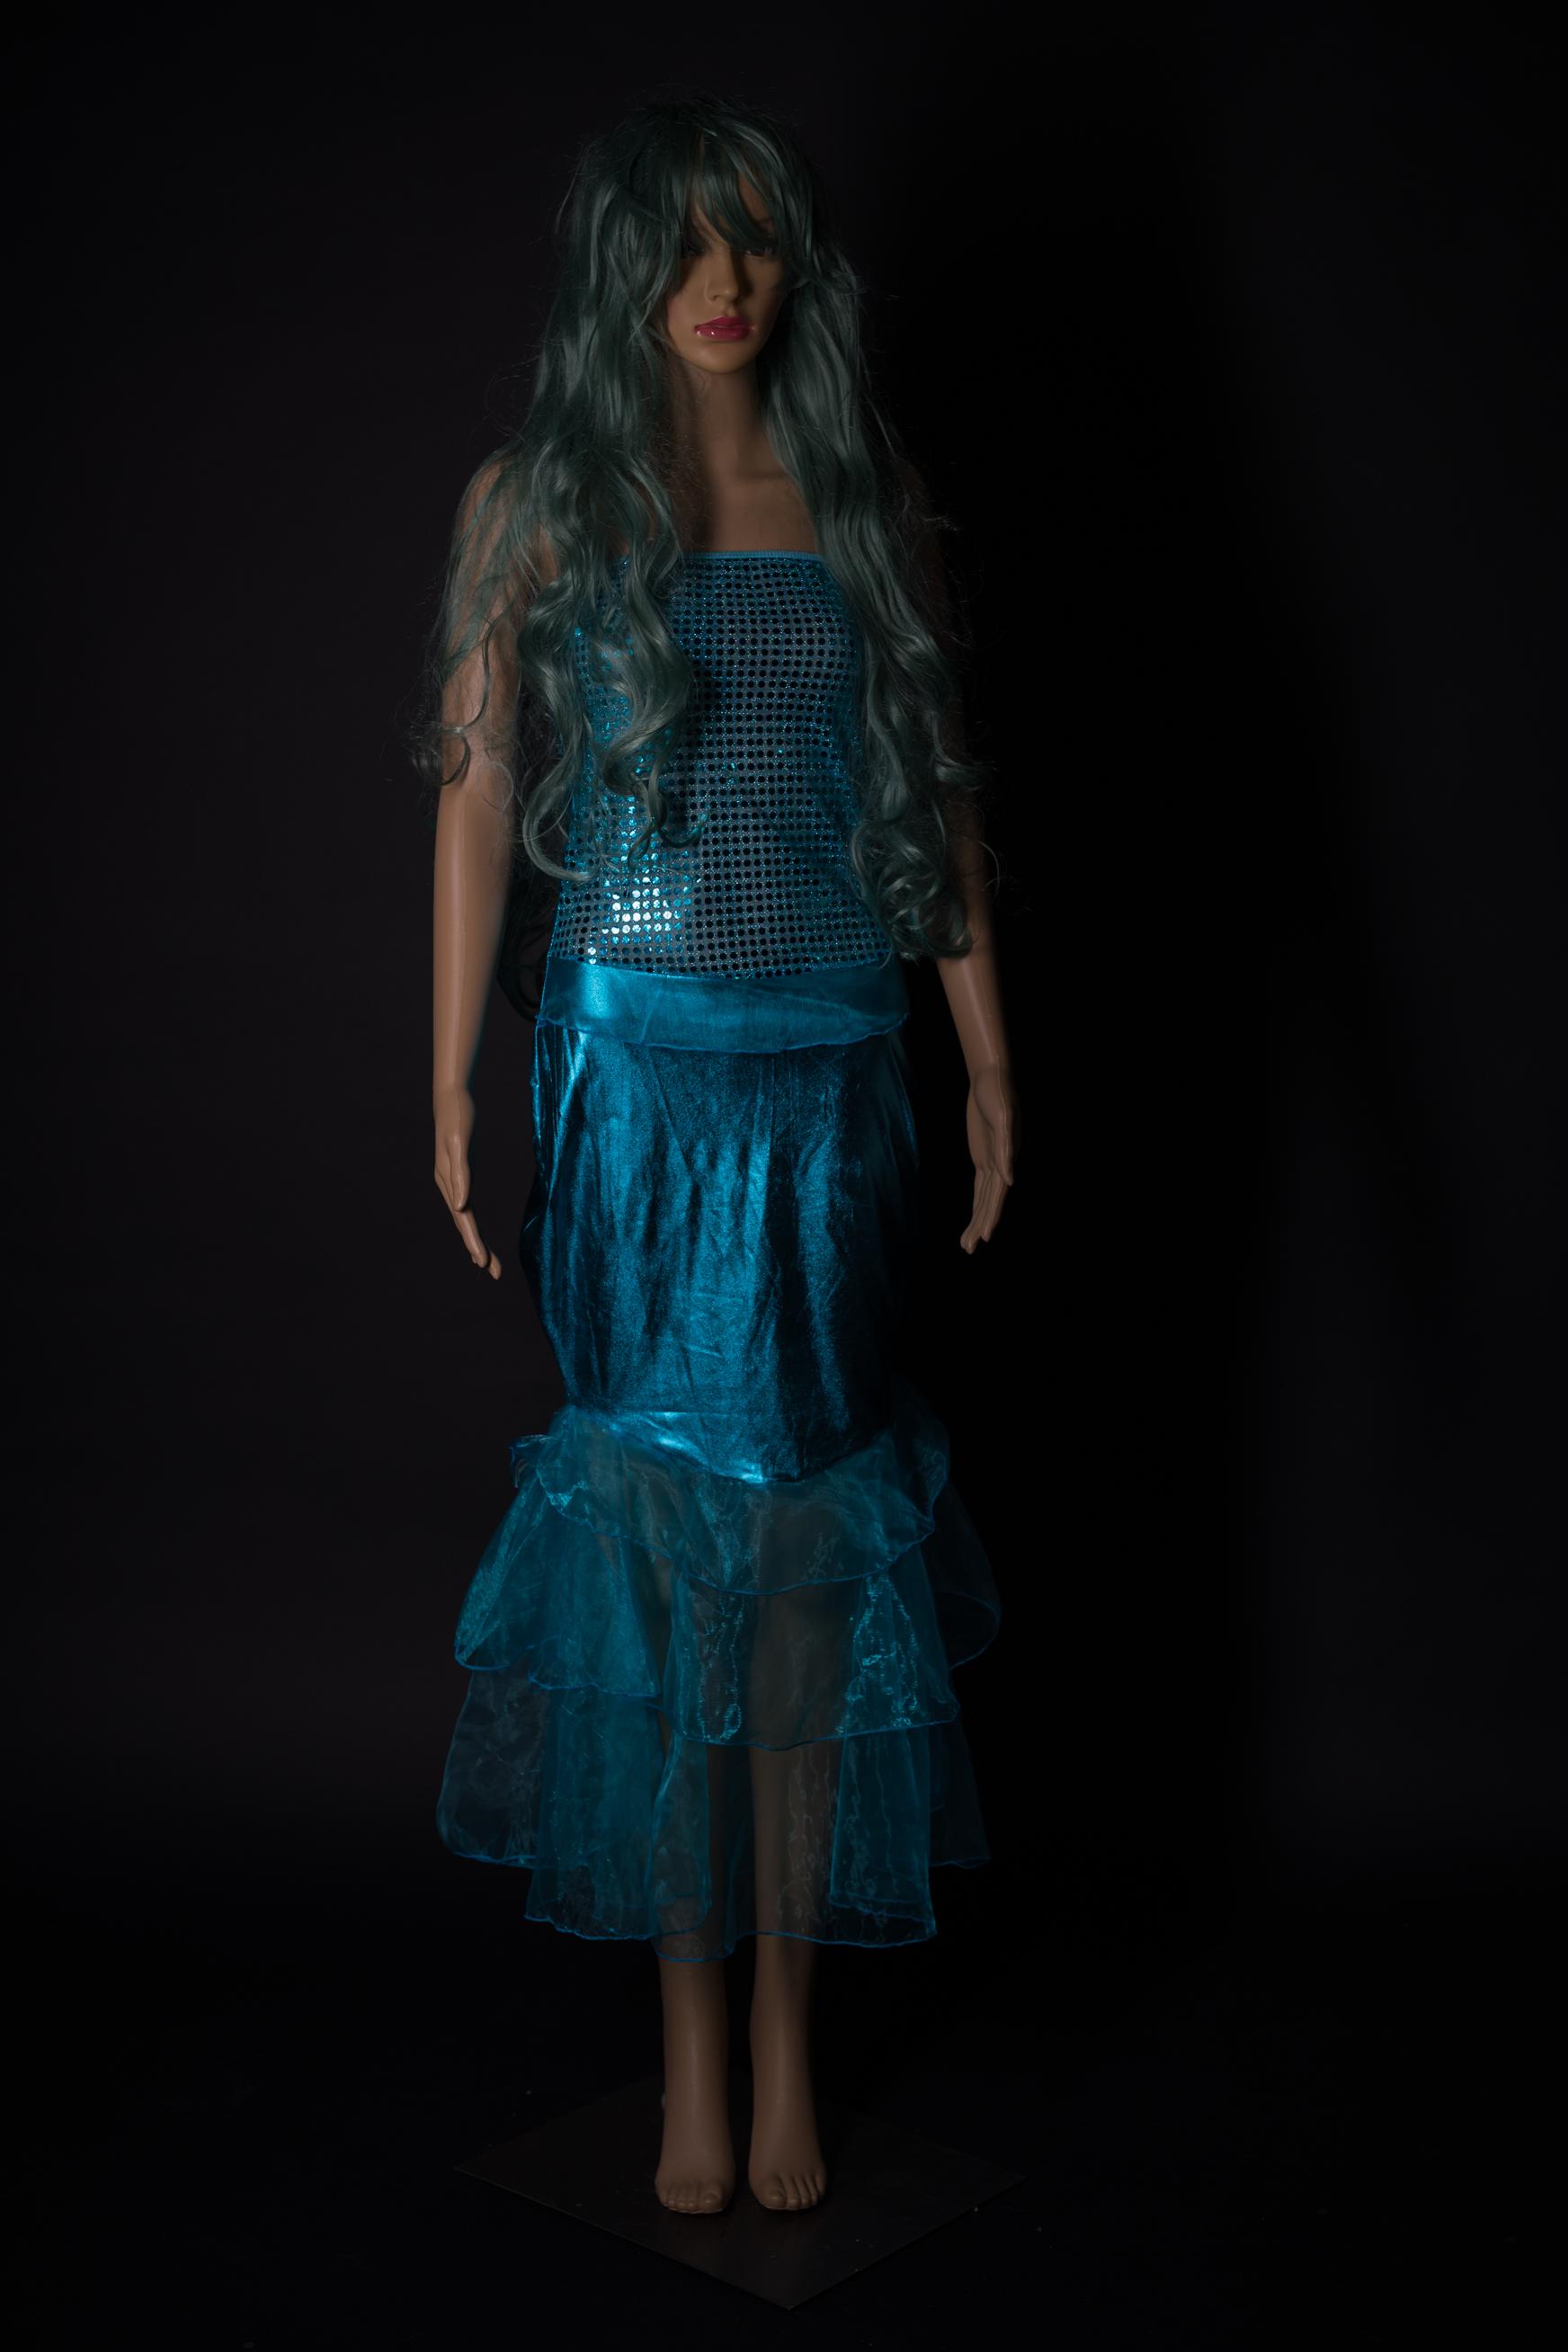 Türkisblaues Mermaidkleid mit pssende Perrücke